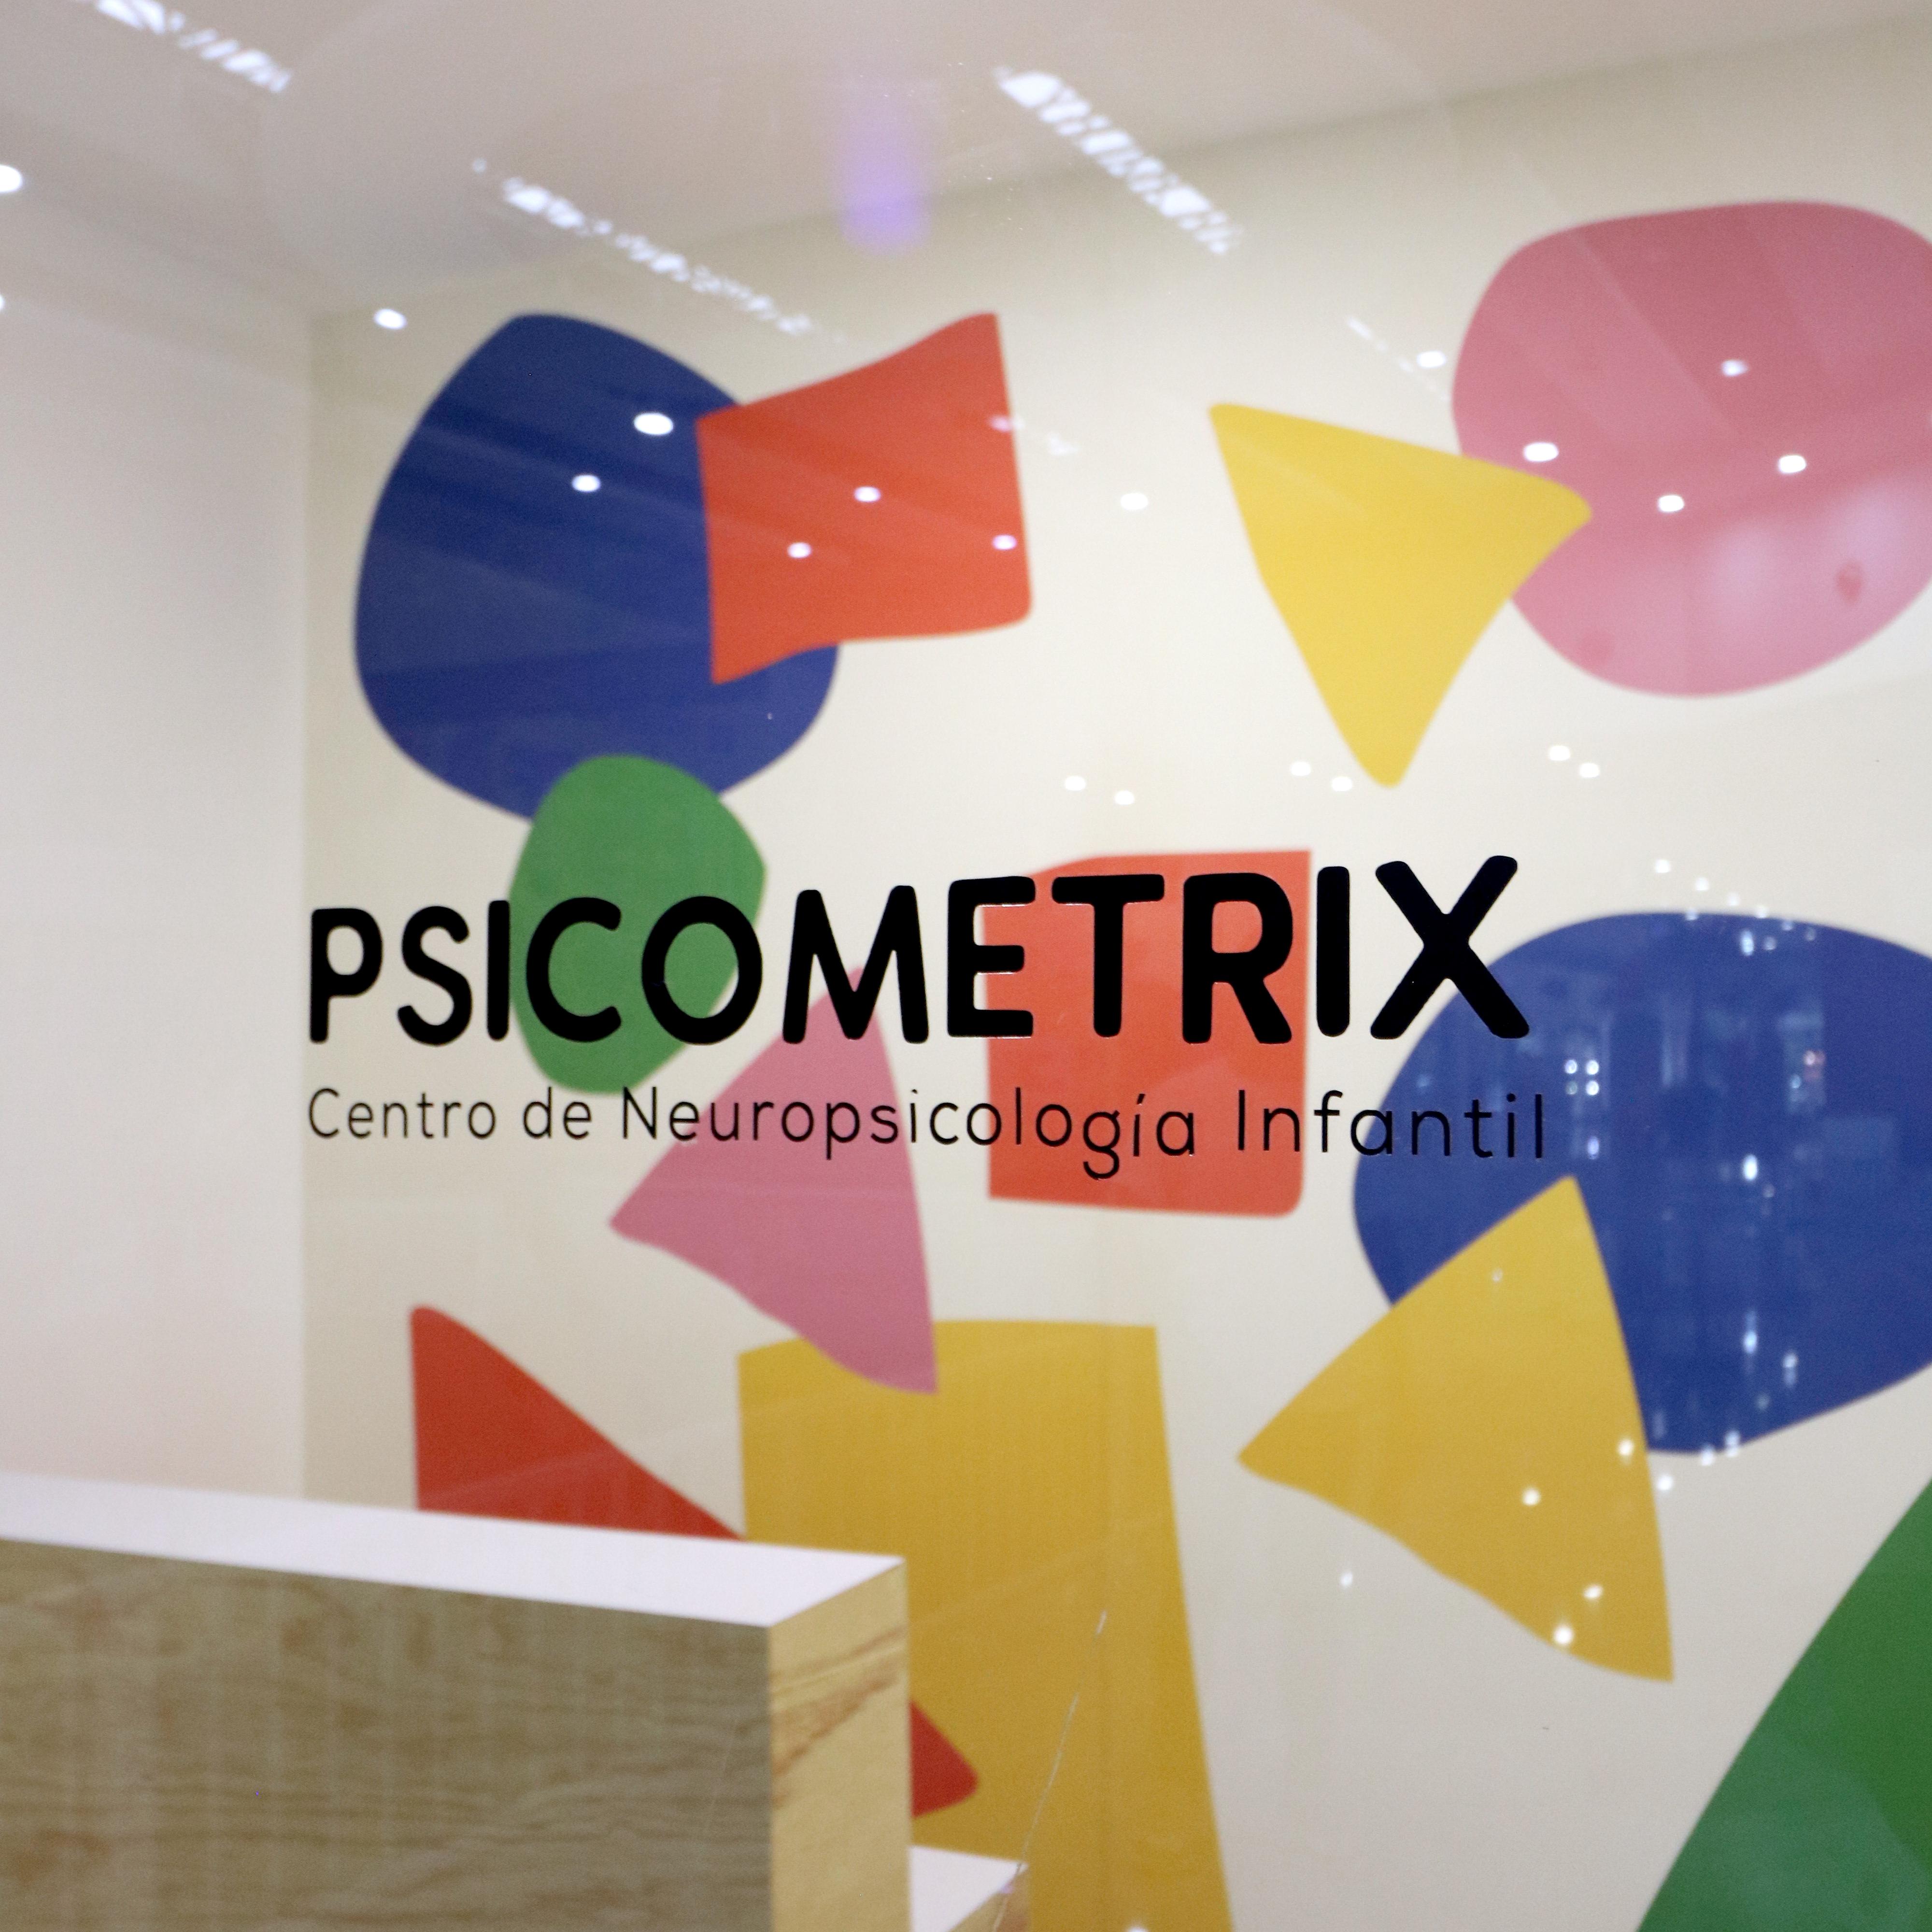 psicometrix